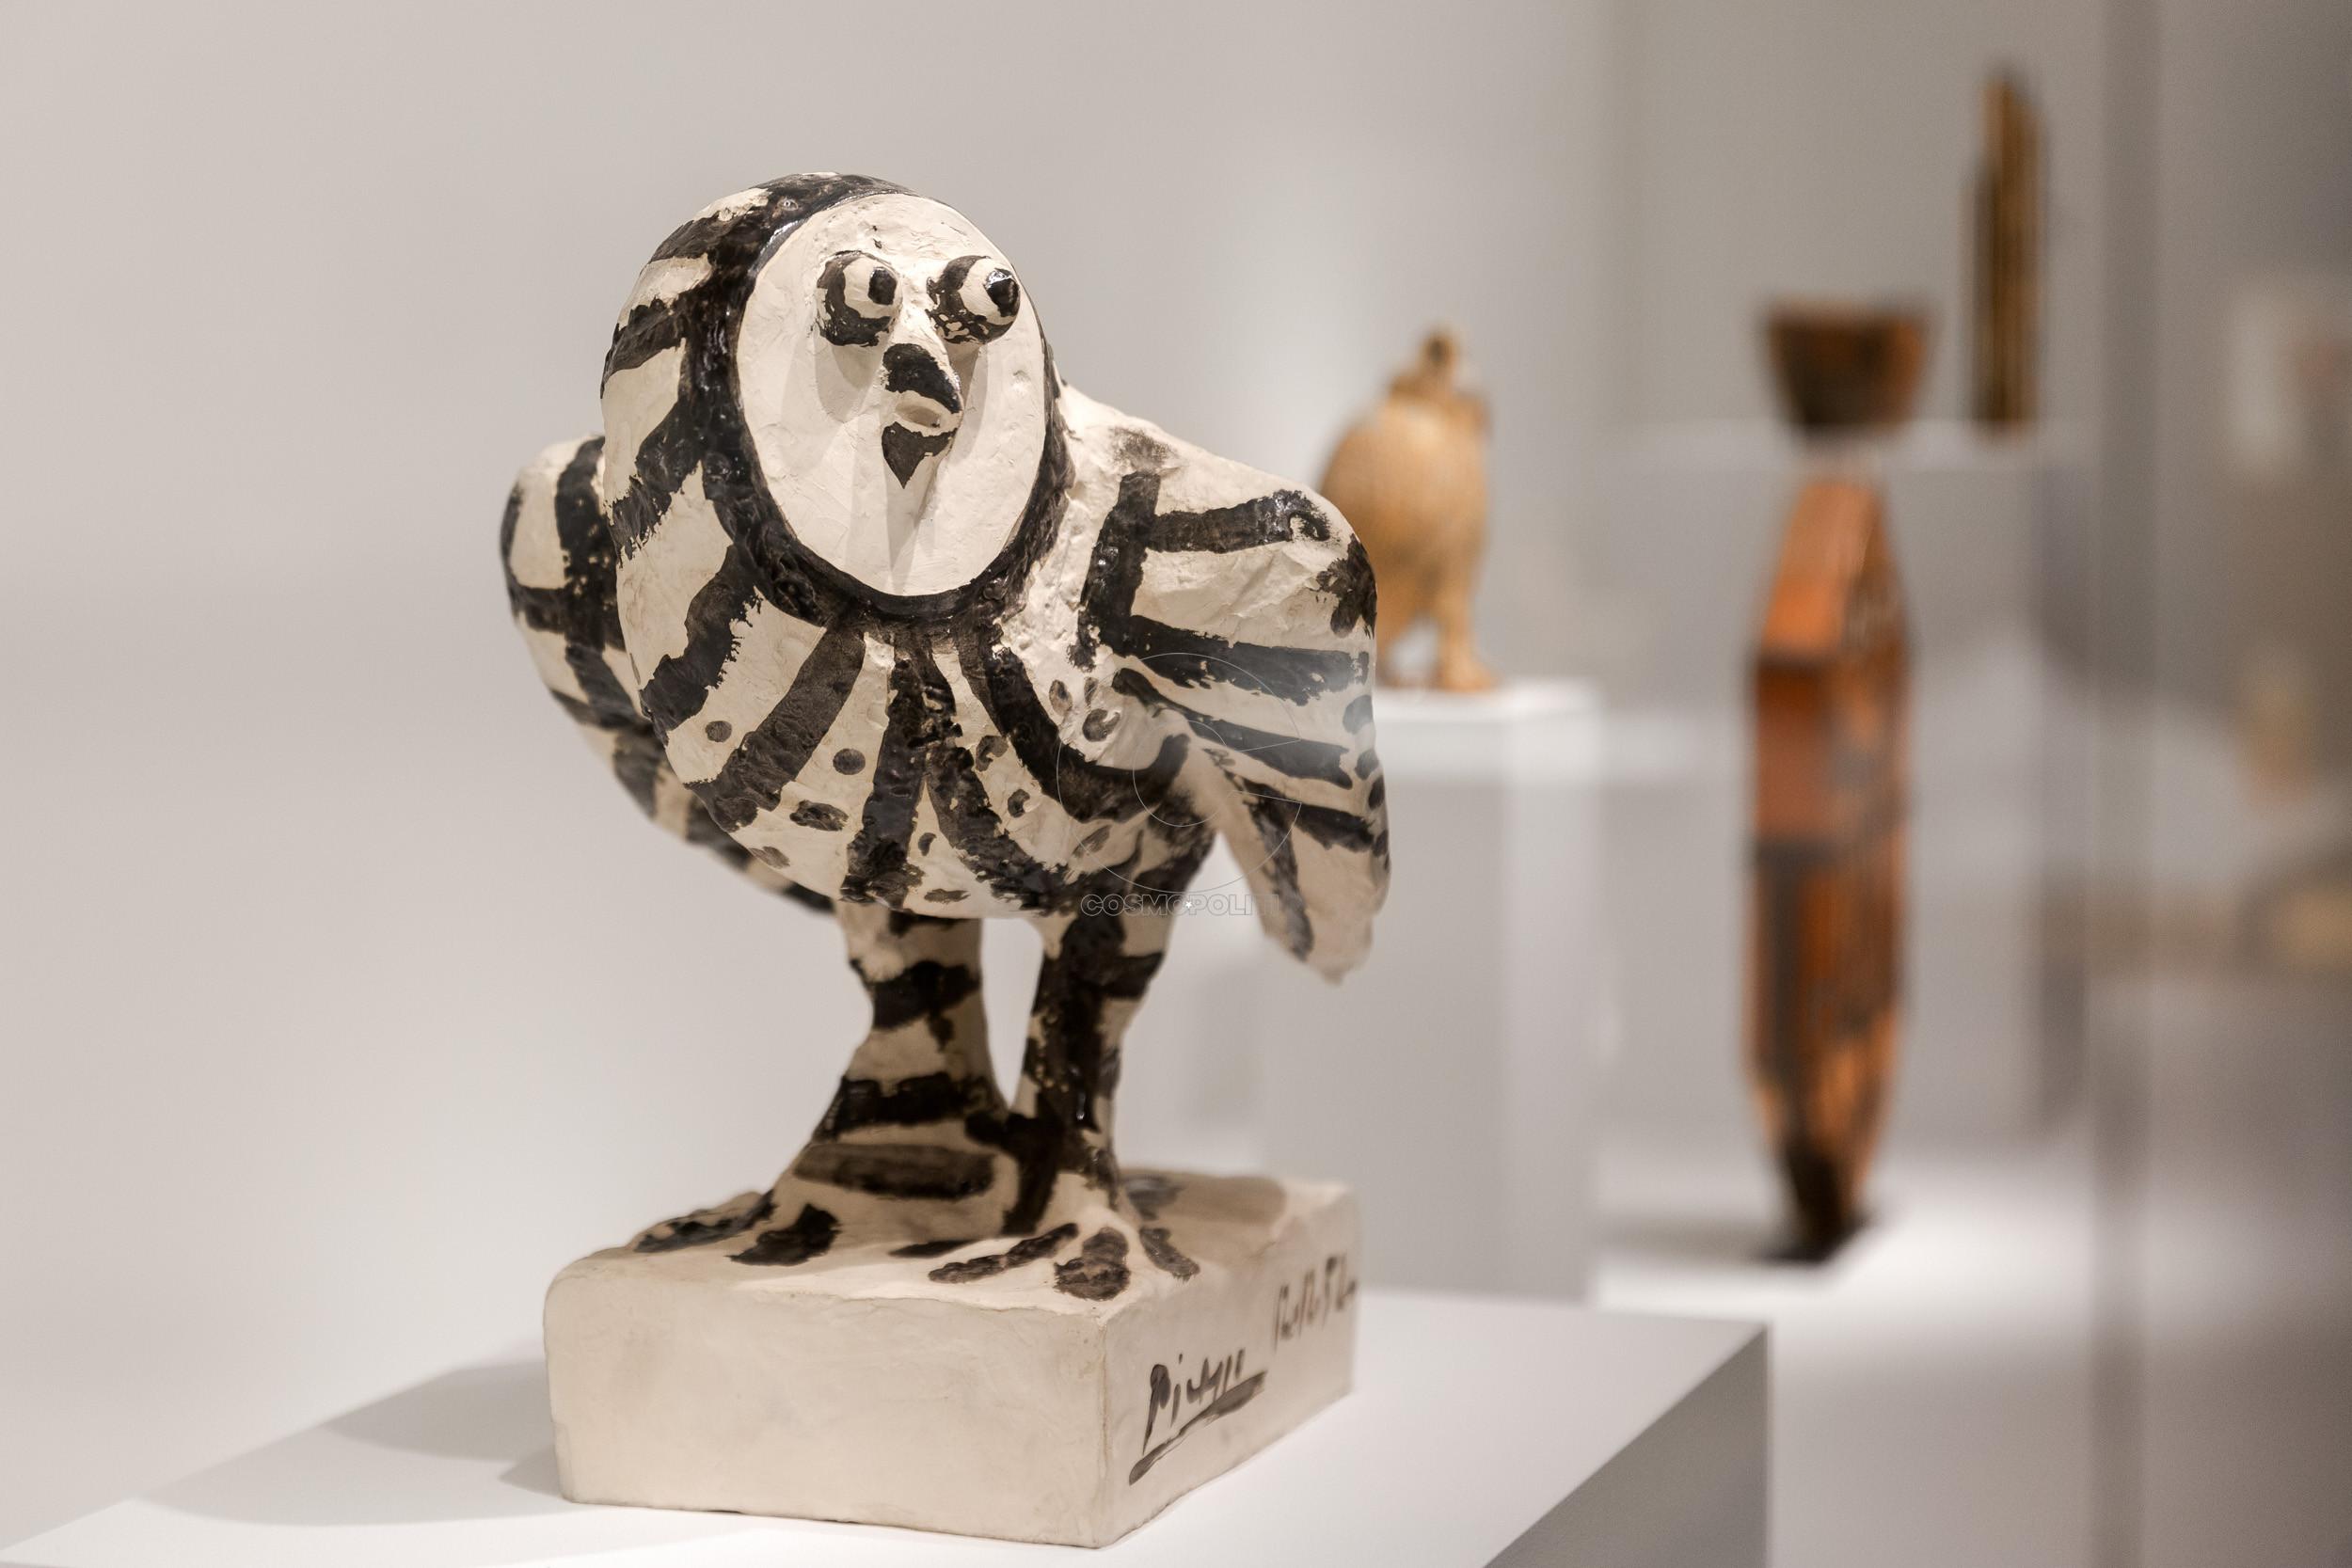 1_MUSEUM OF CYCLADIC ART© PHOTO PARIS TAVITIAN